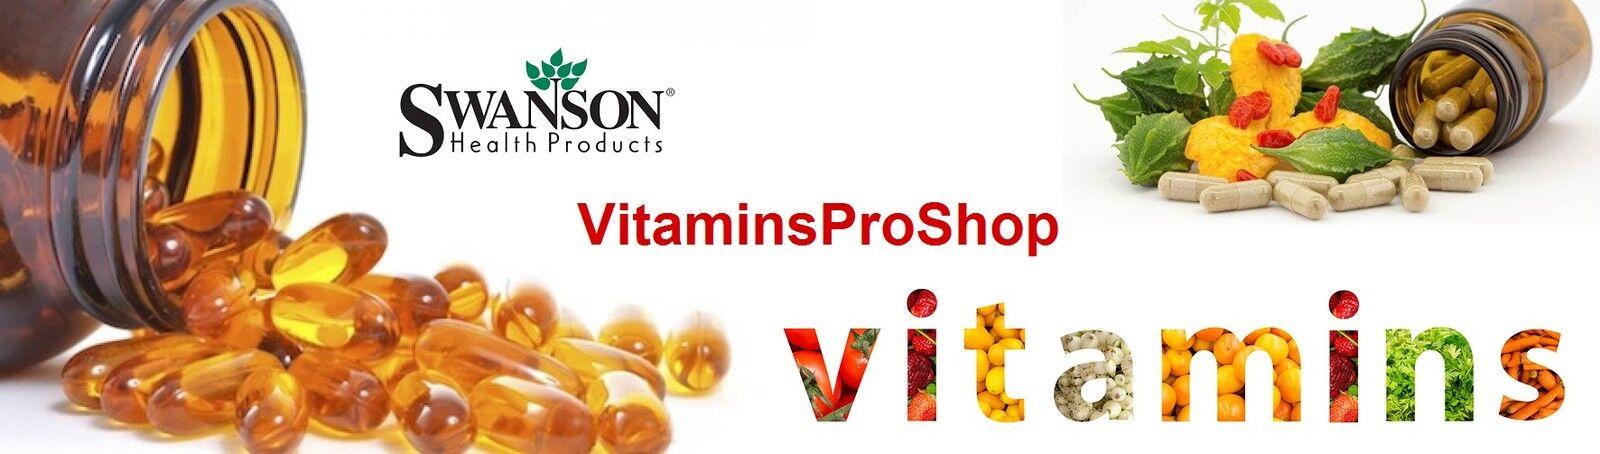 VitaminsProShop